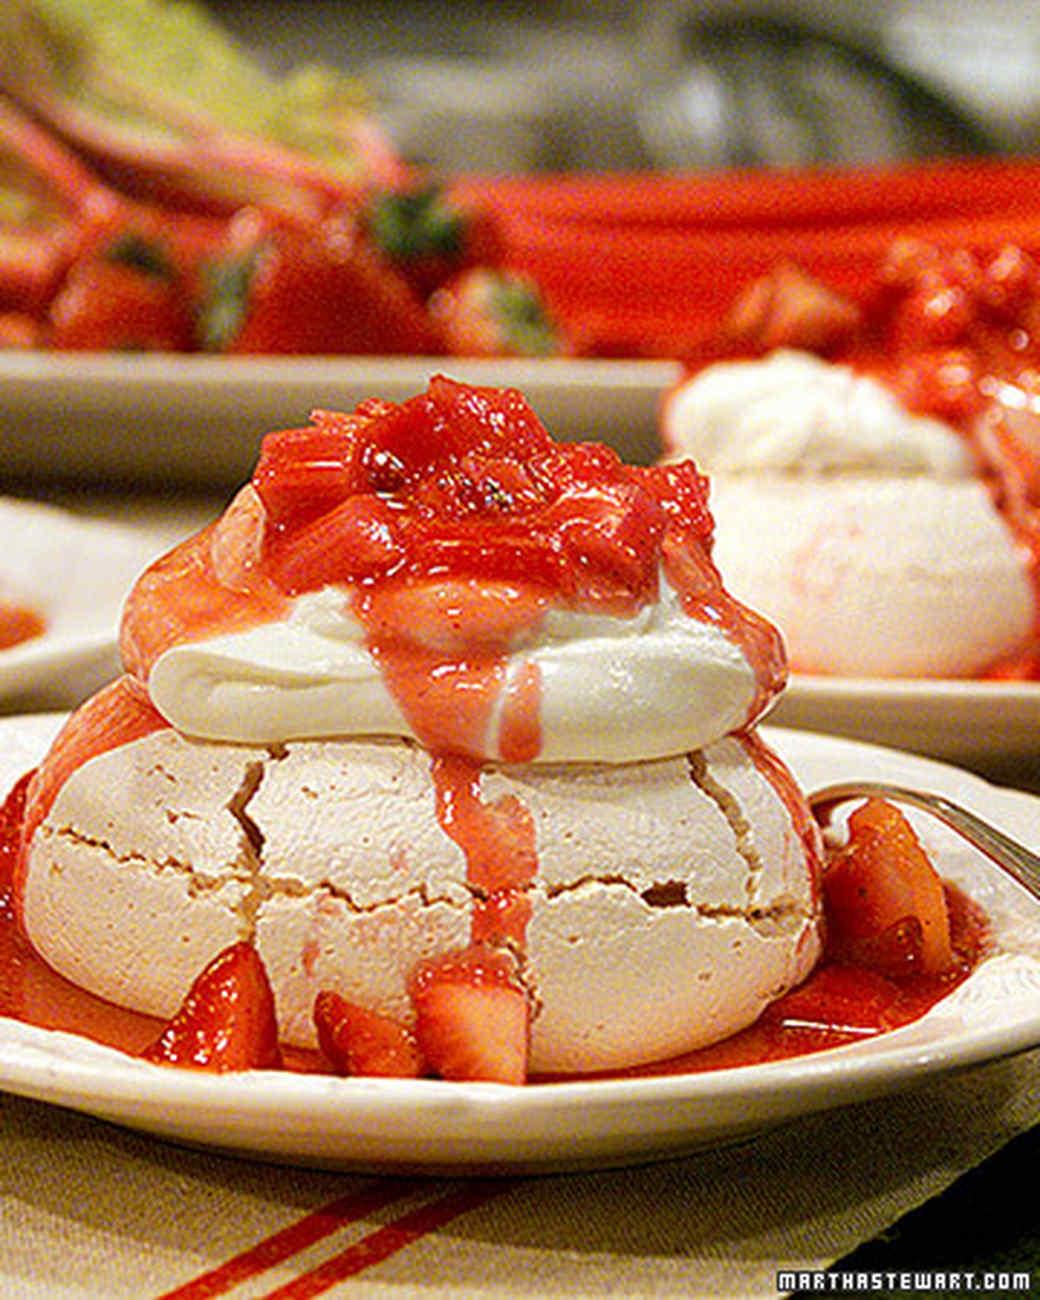 Nicole's Rhubarb-Strawberry Pavlova